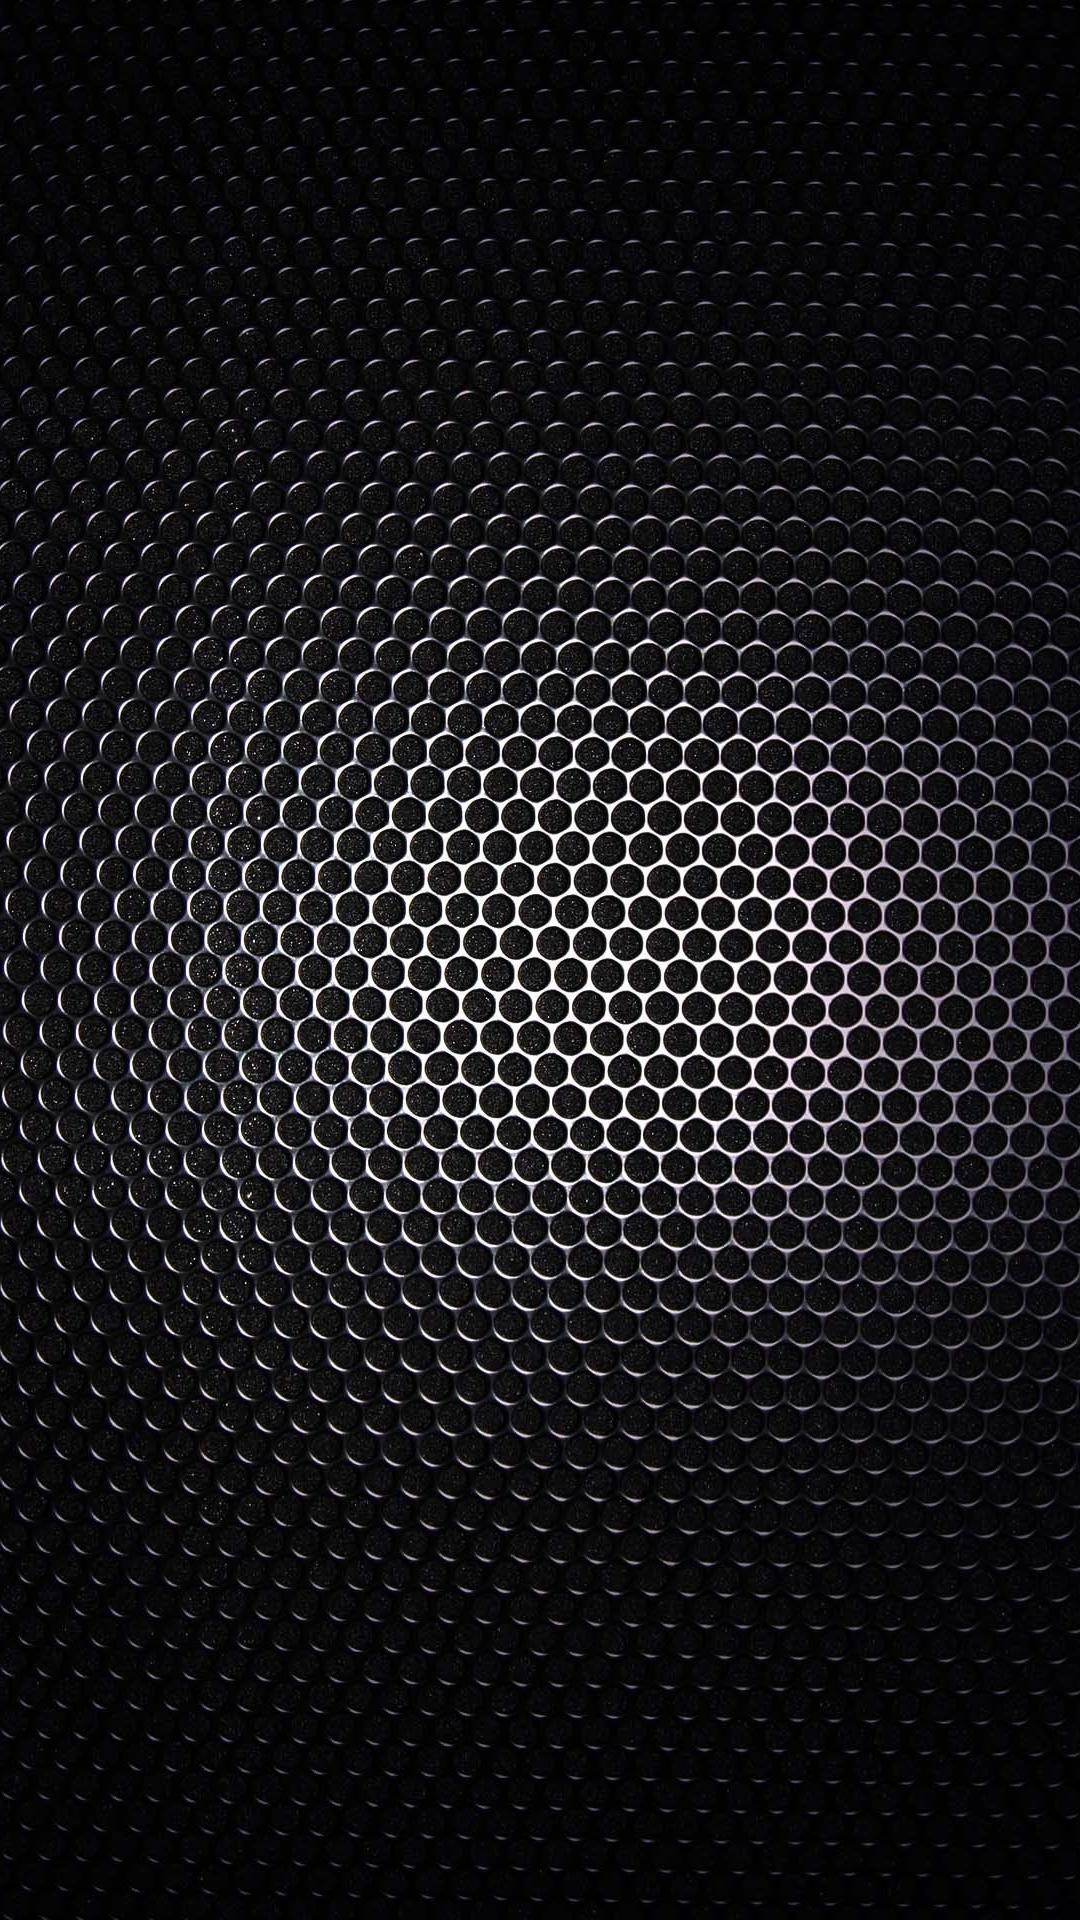 Wallpapers for Galaxy - Black Gradient Metal Grid